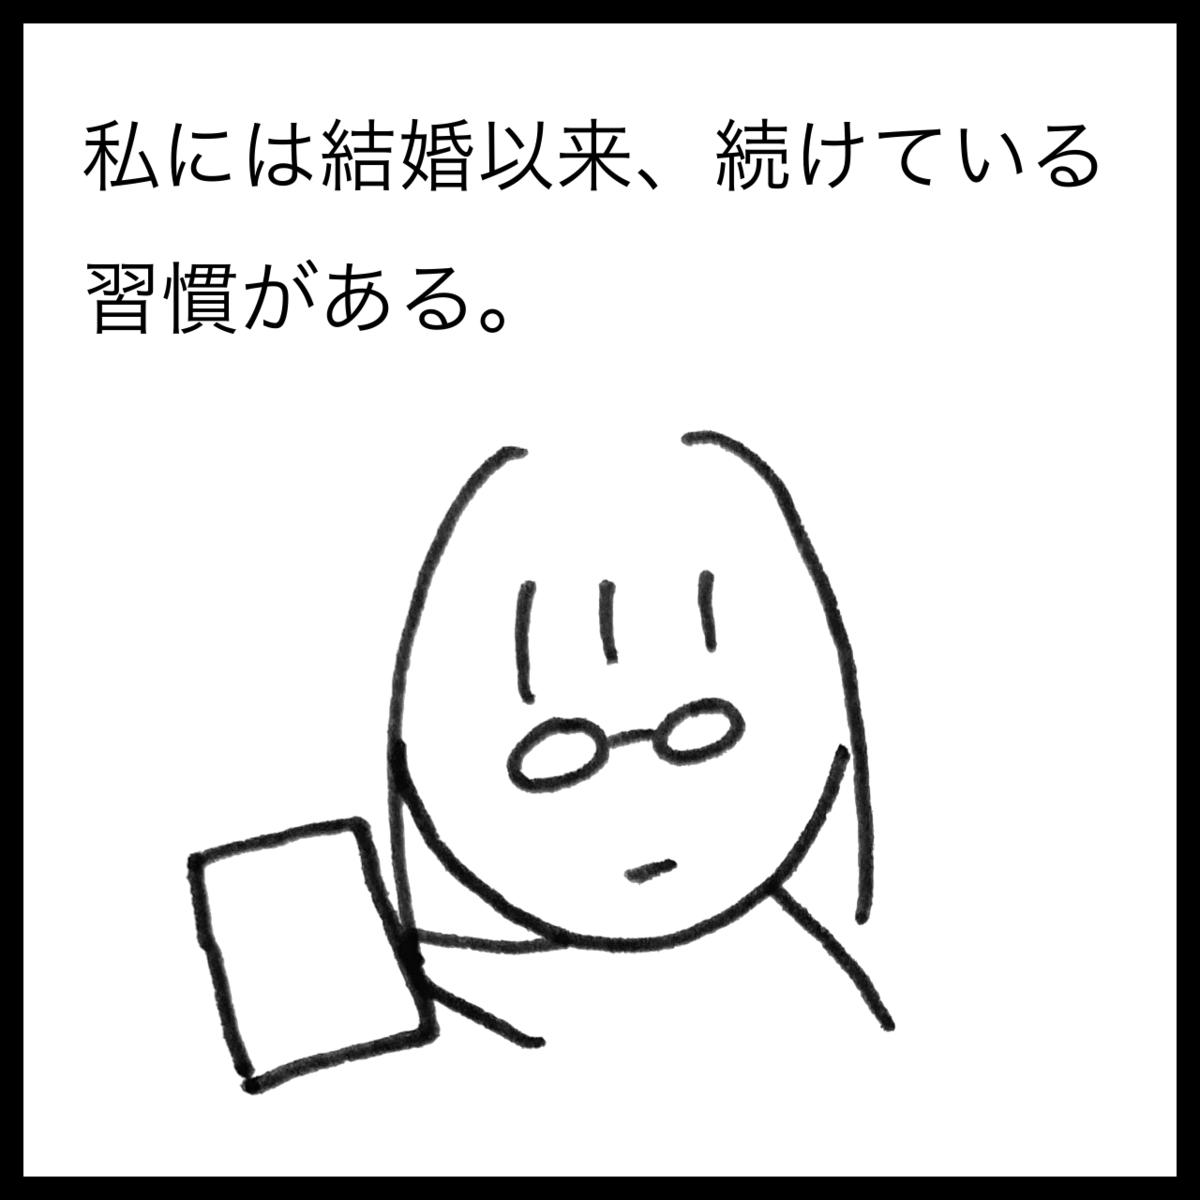 f:id:komyusyomama:20210823105050p:plain